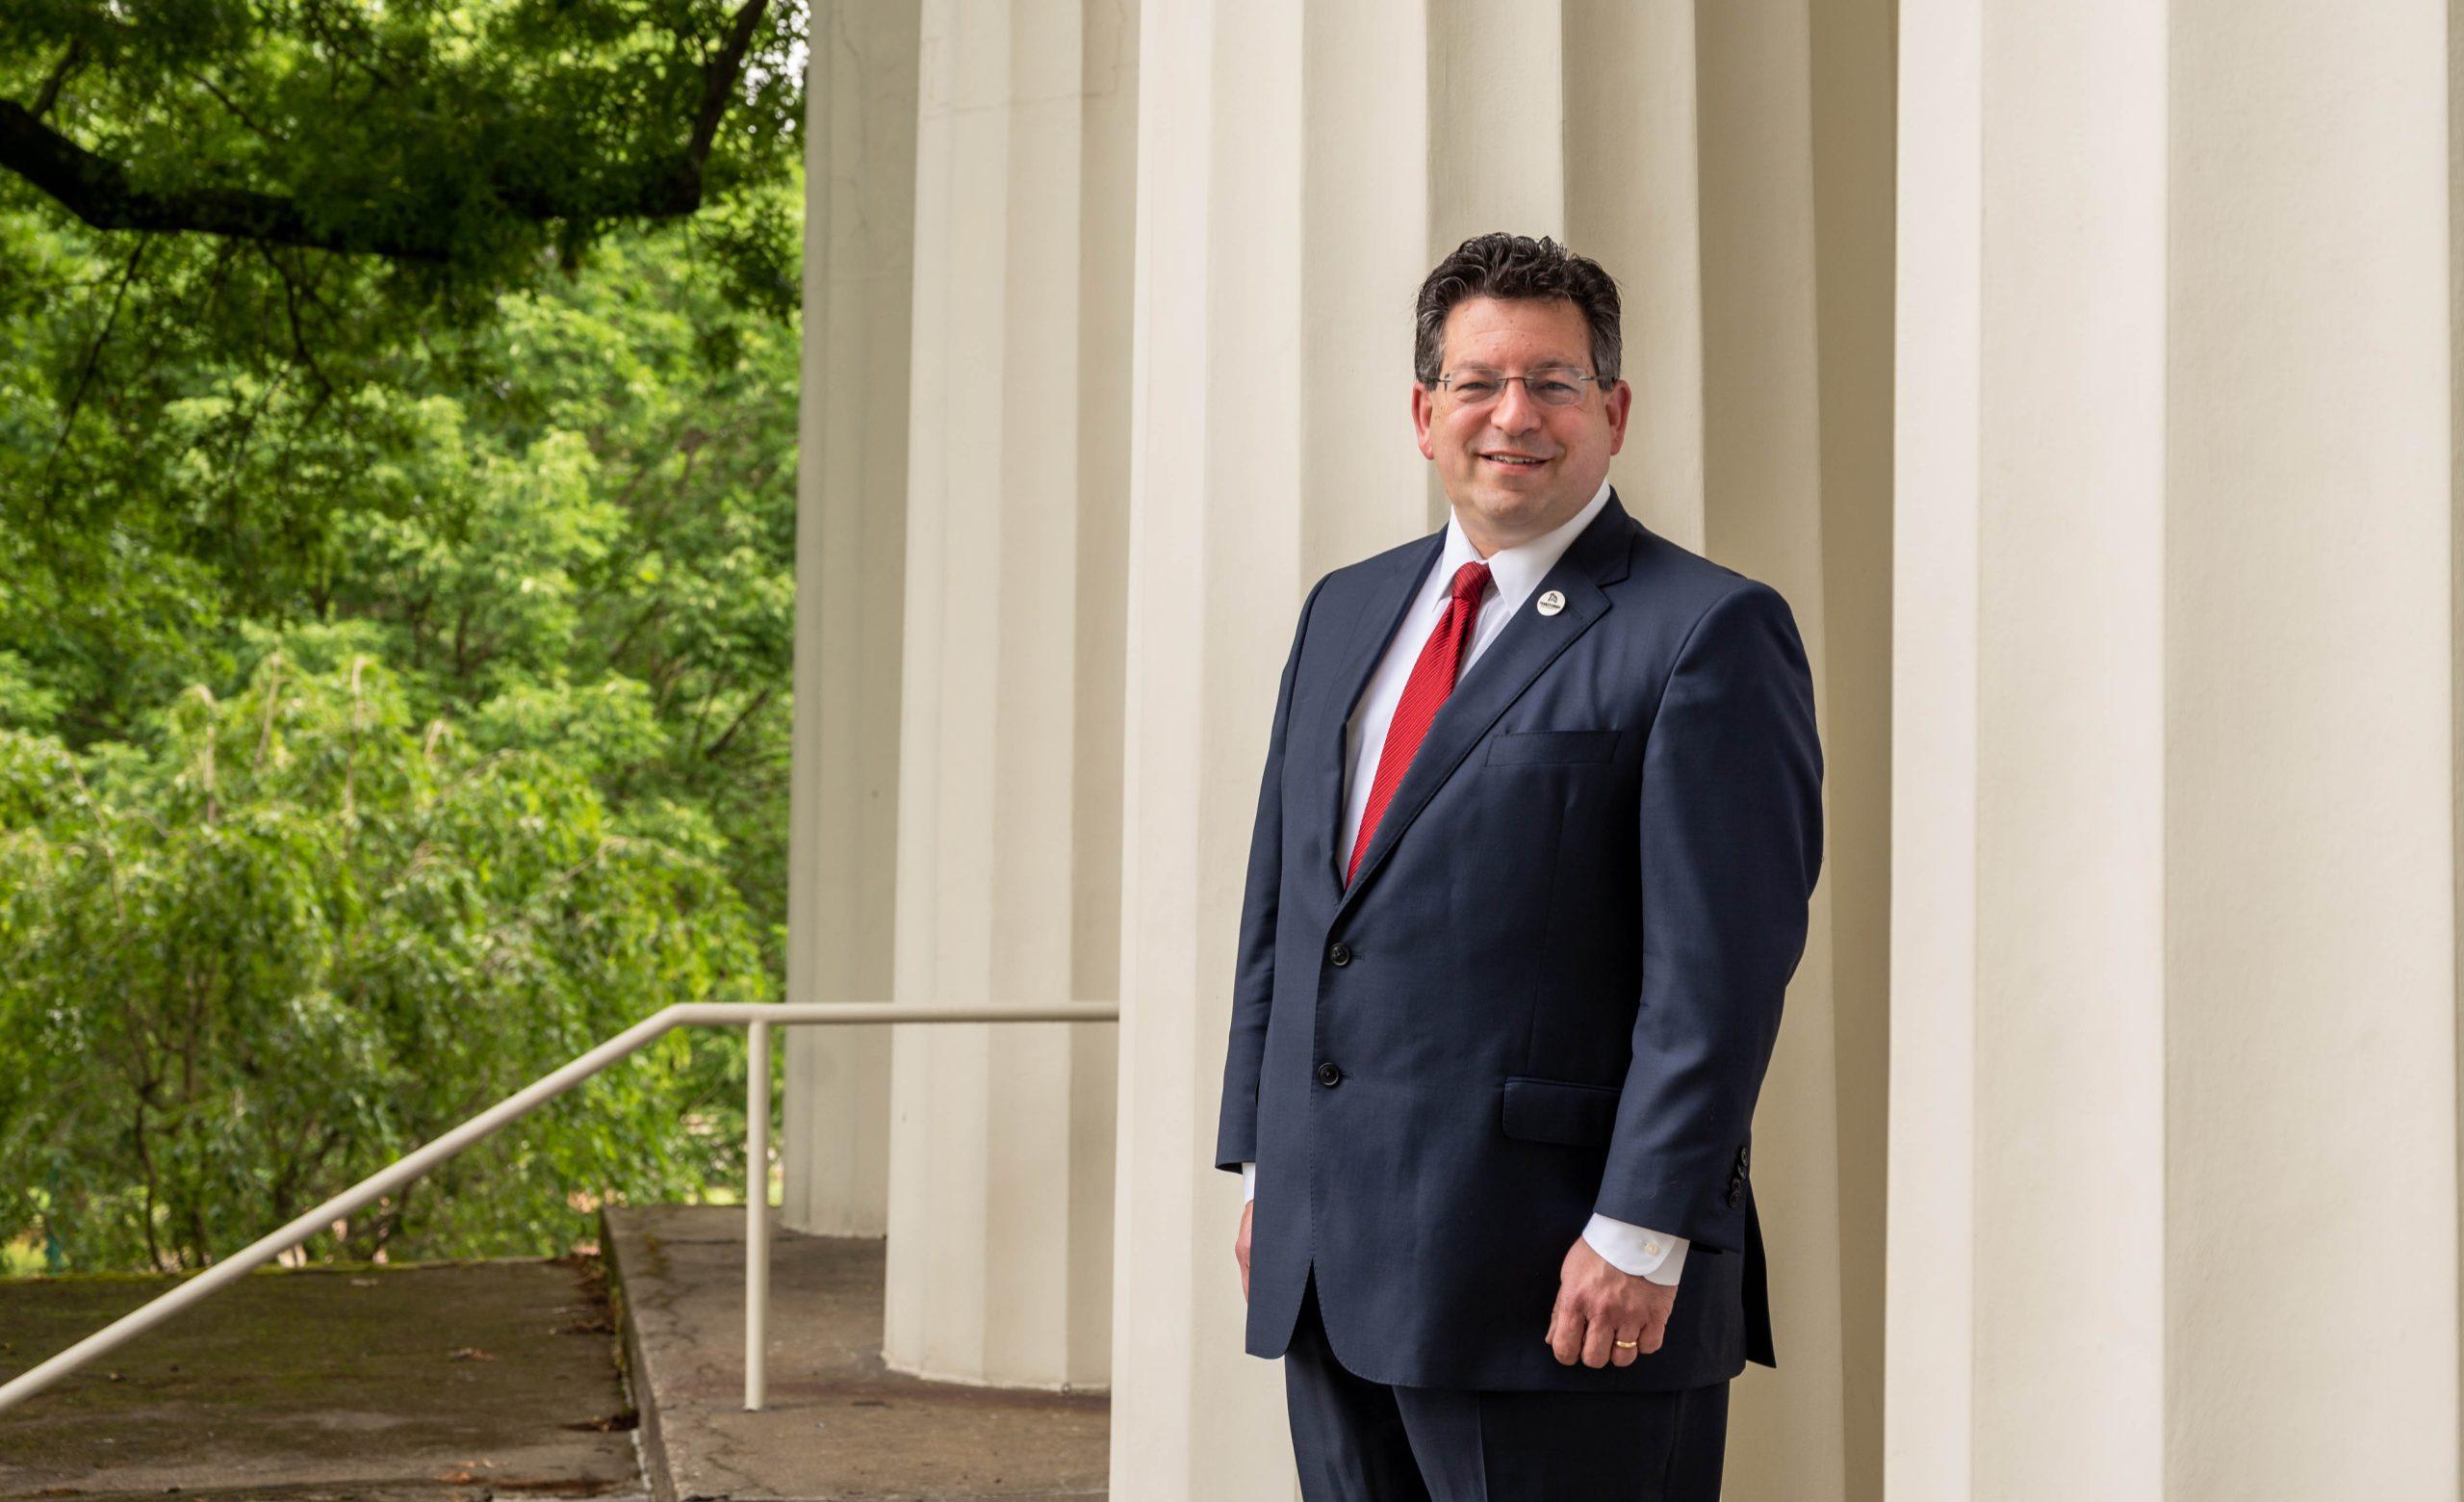 Transylvania president joins Leadership Kentucky 2021 class